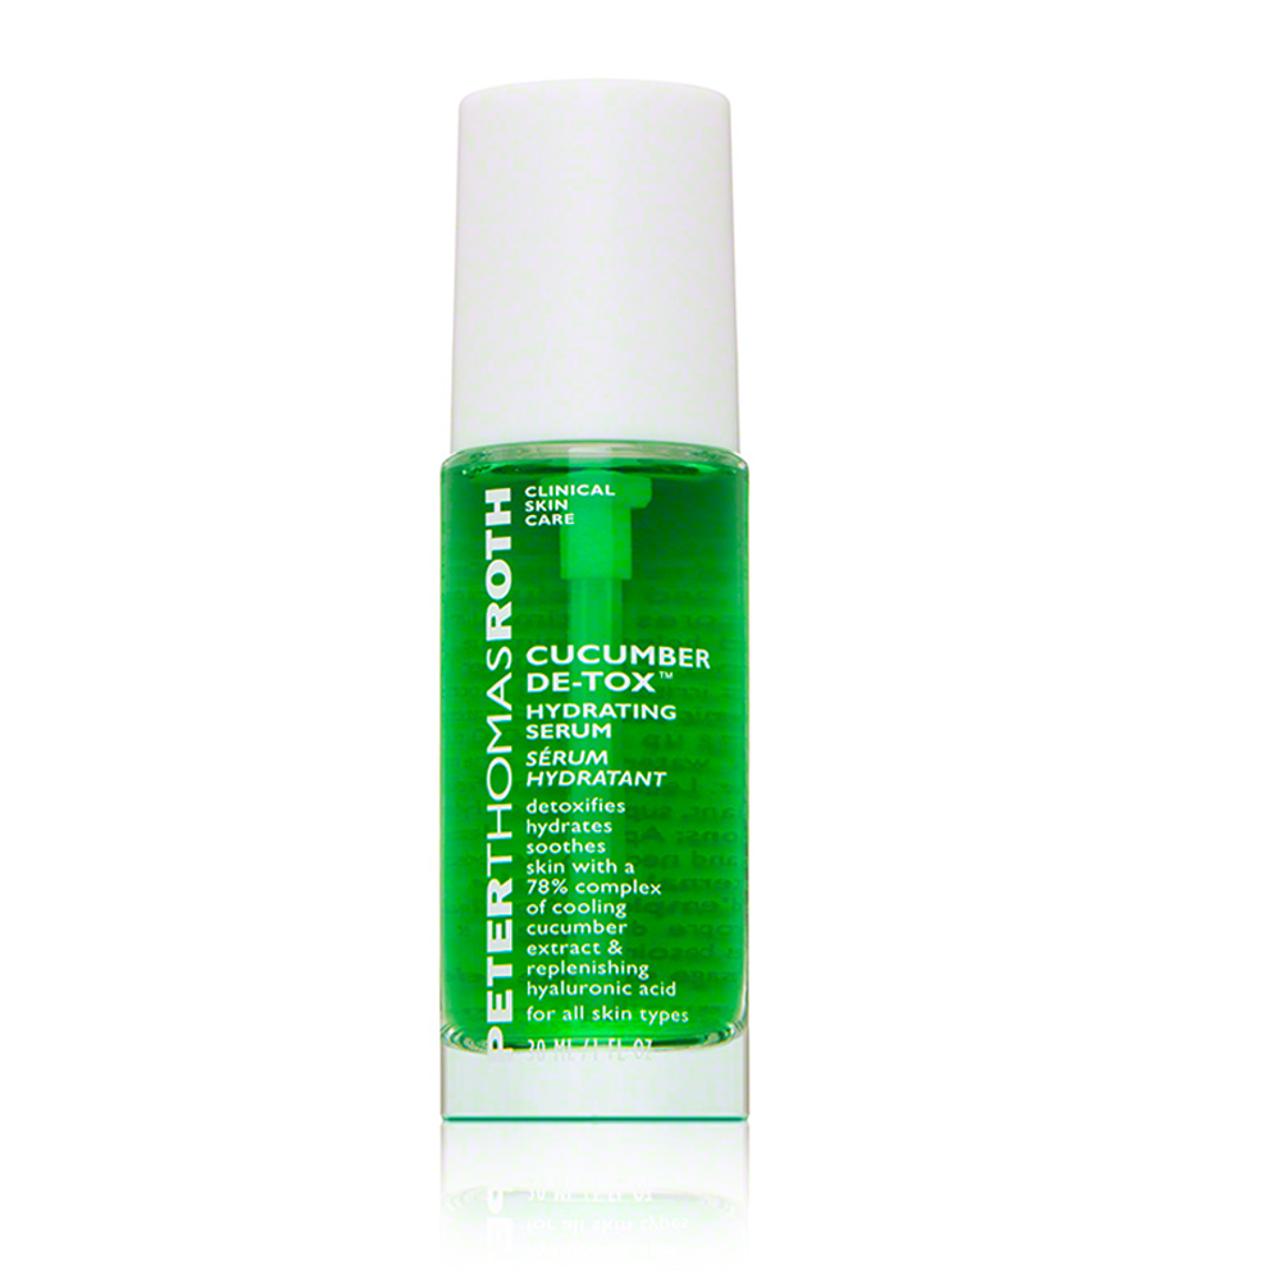 Peter Thomas Roth Cucumber De-Tox Hydrating Serum BeautifiedYou.com